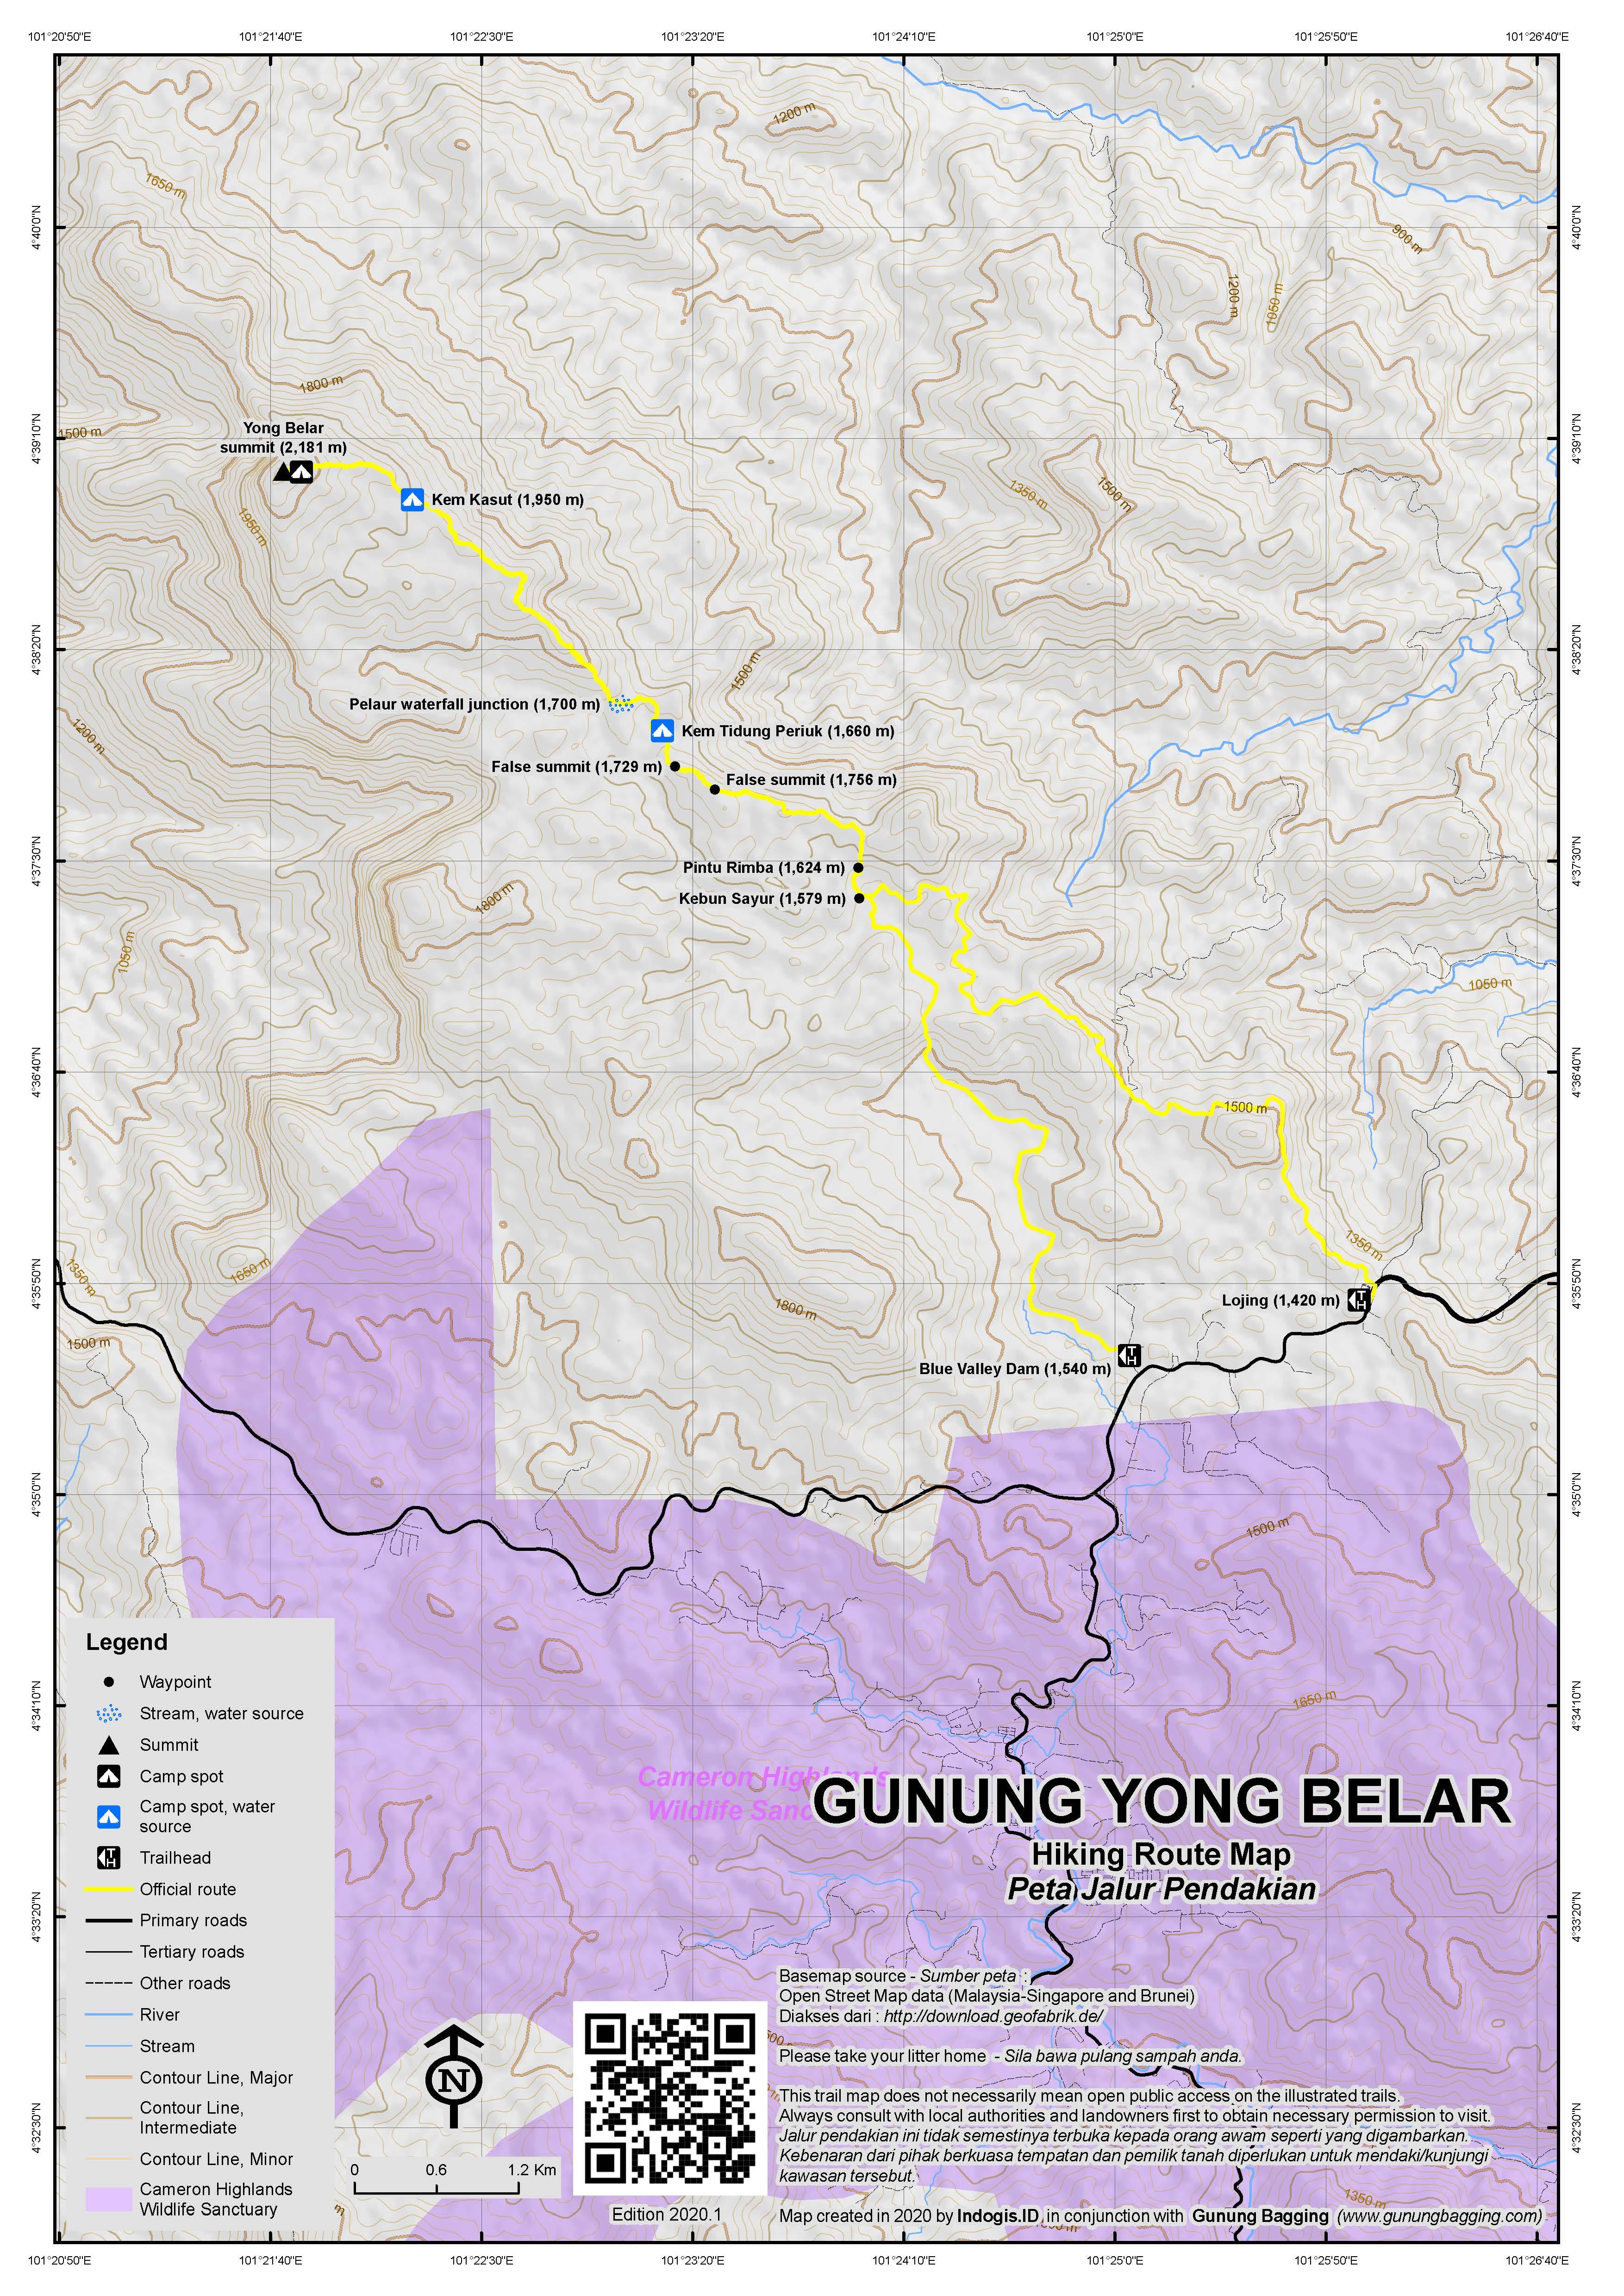 Peta Jalur Pendakian Gunung Yong Belar